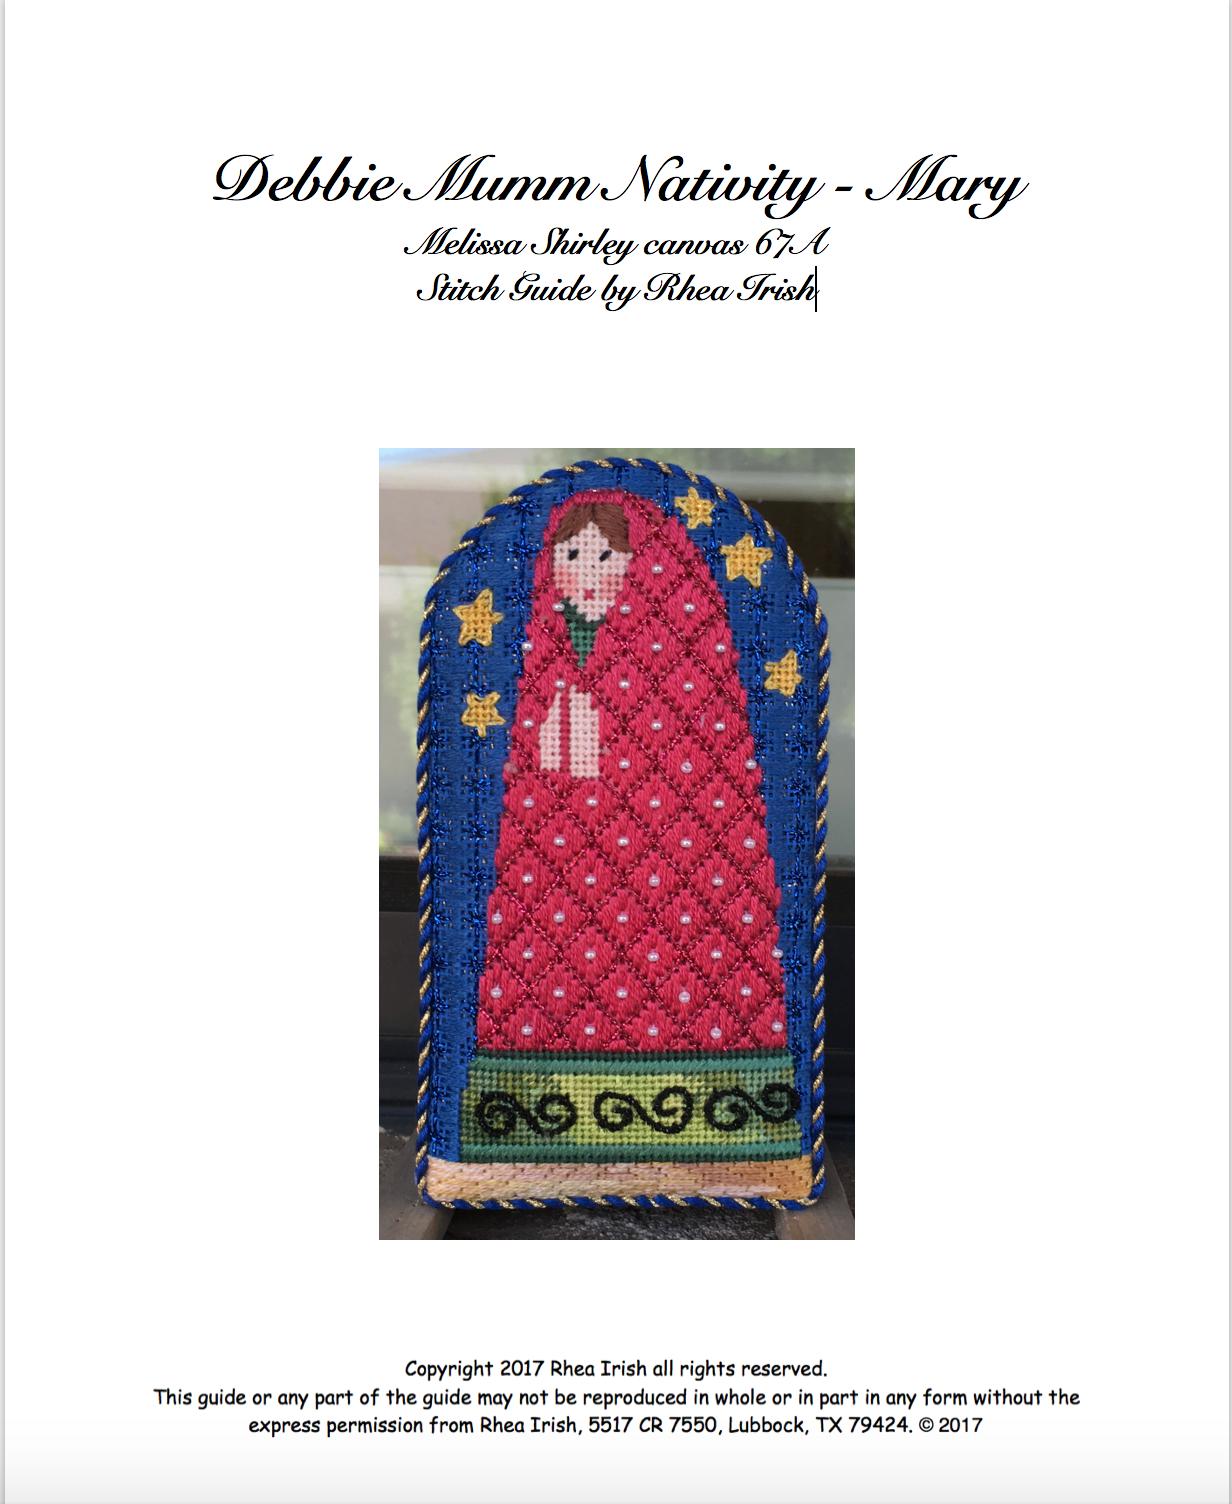 Debbie Mumm Nativity-Mary.png